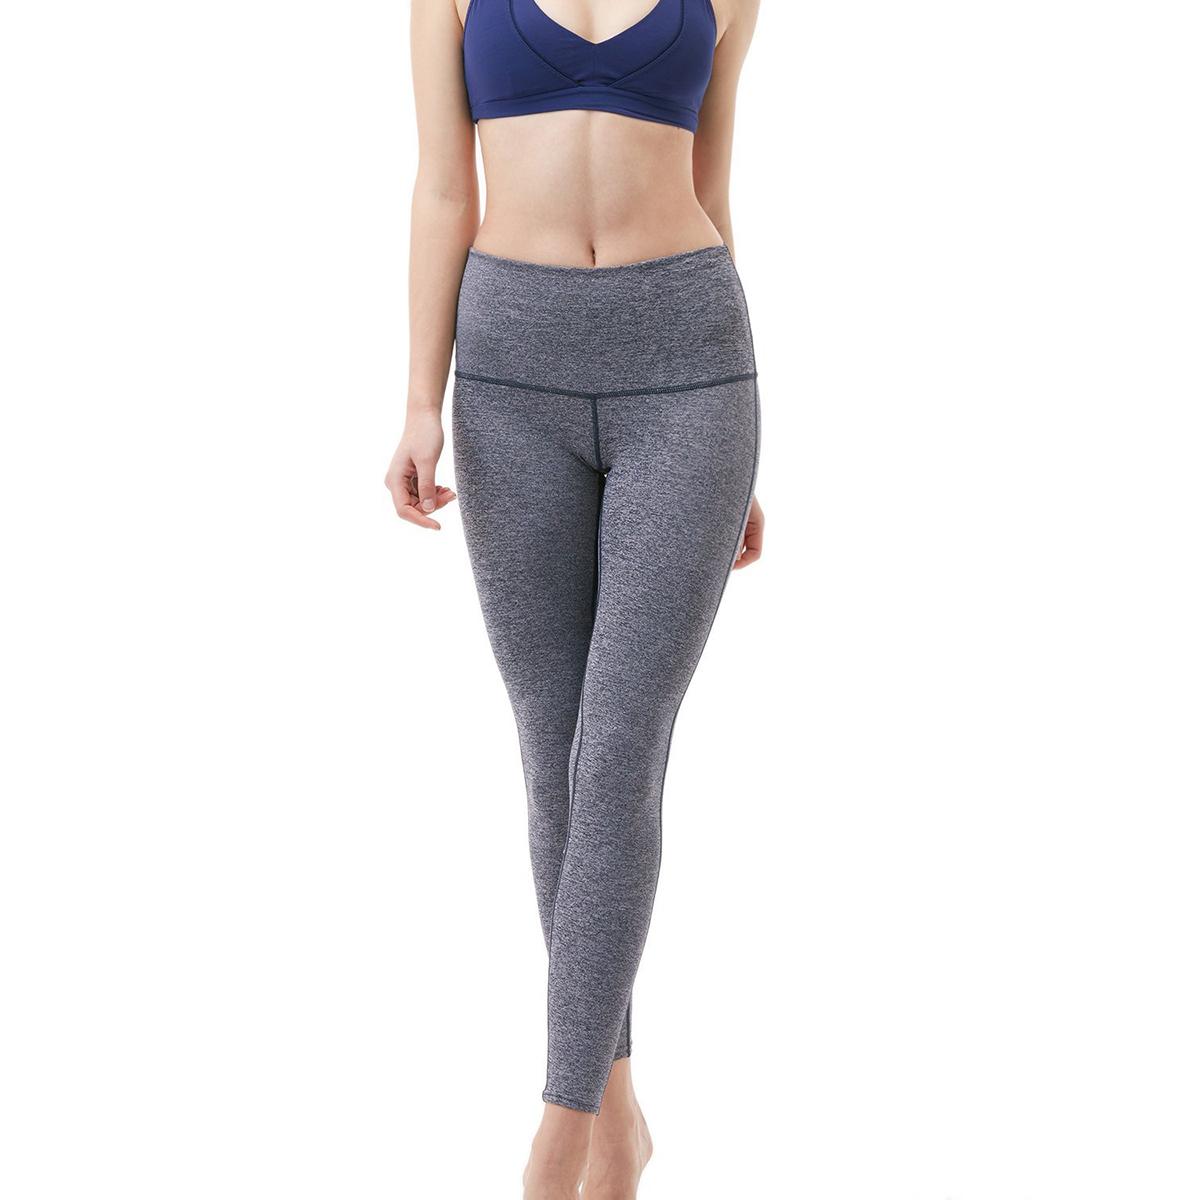 thumbnail 84 - TSLA Tesla FYP42 Women's High-Waisted Ultra-Stretch Tummy Control Yoga Pants